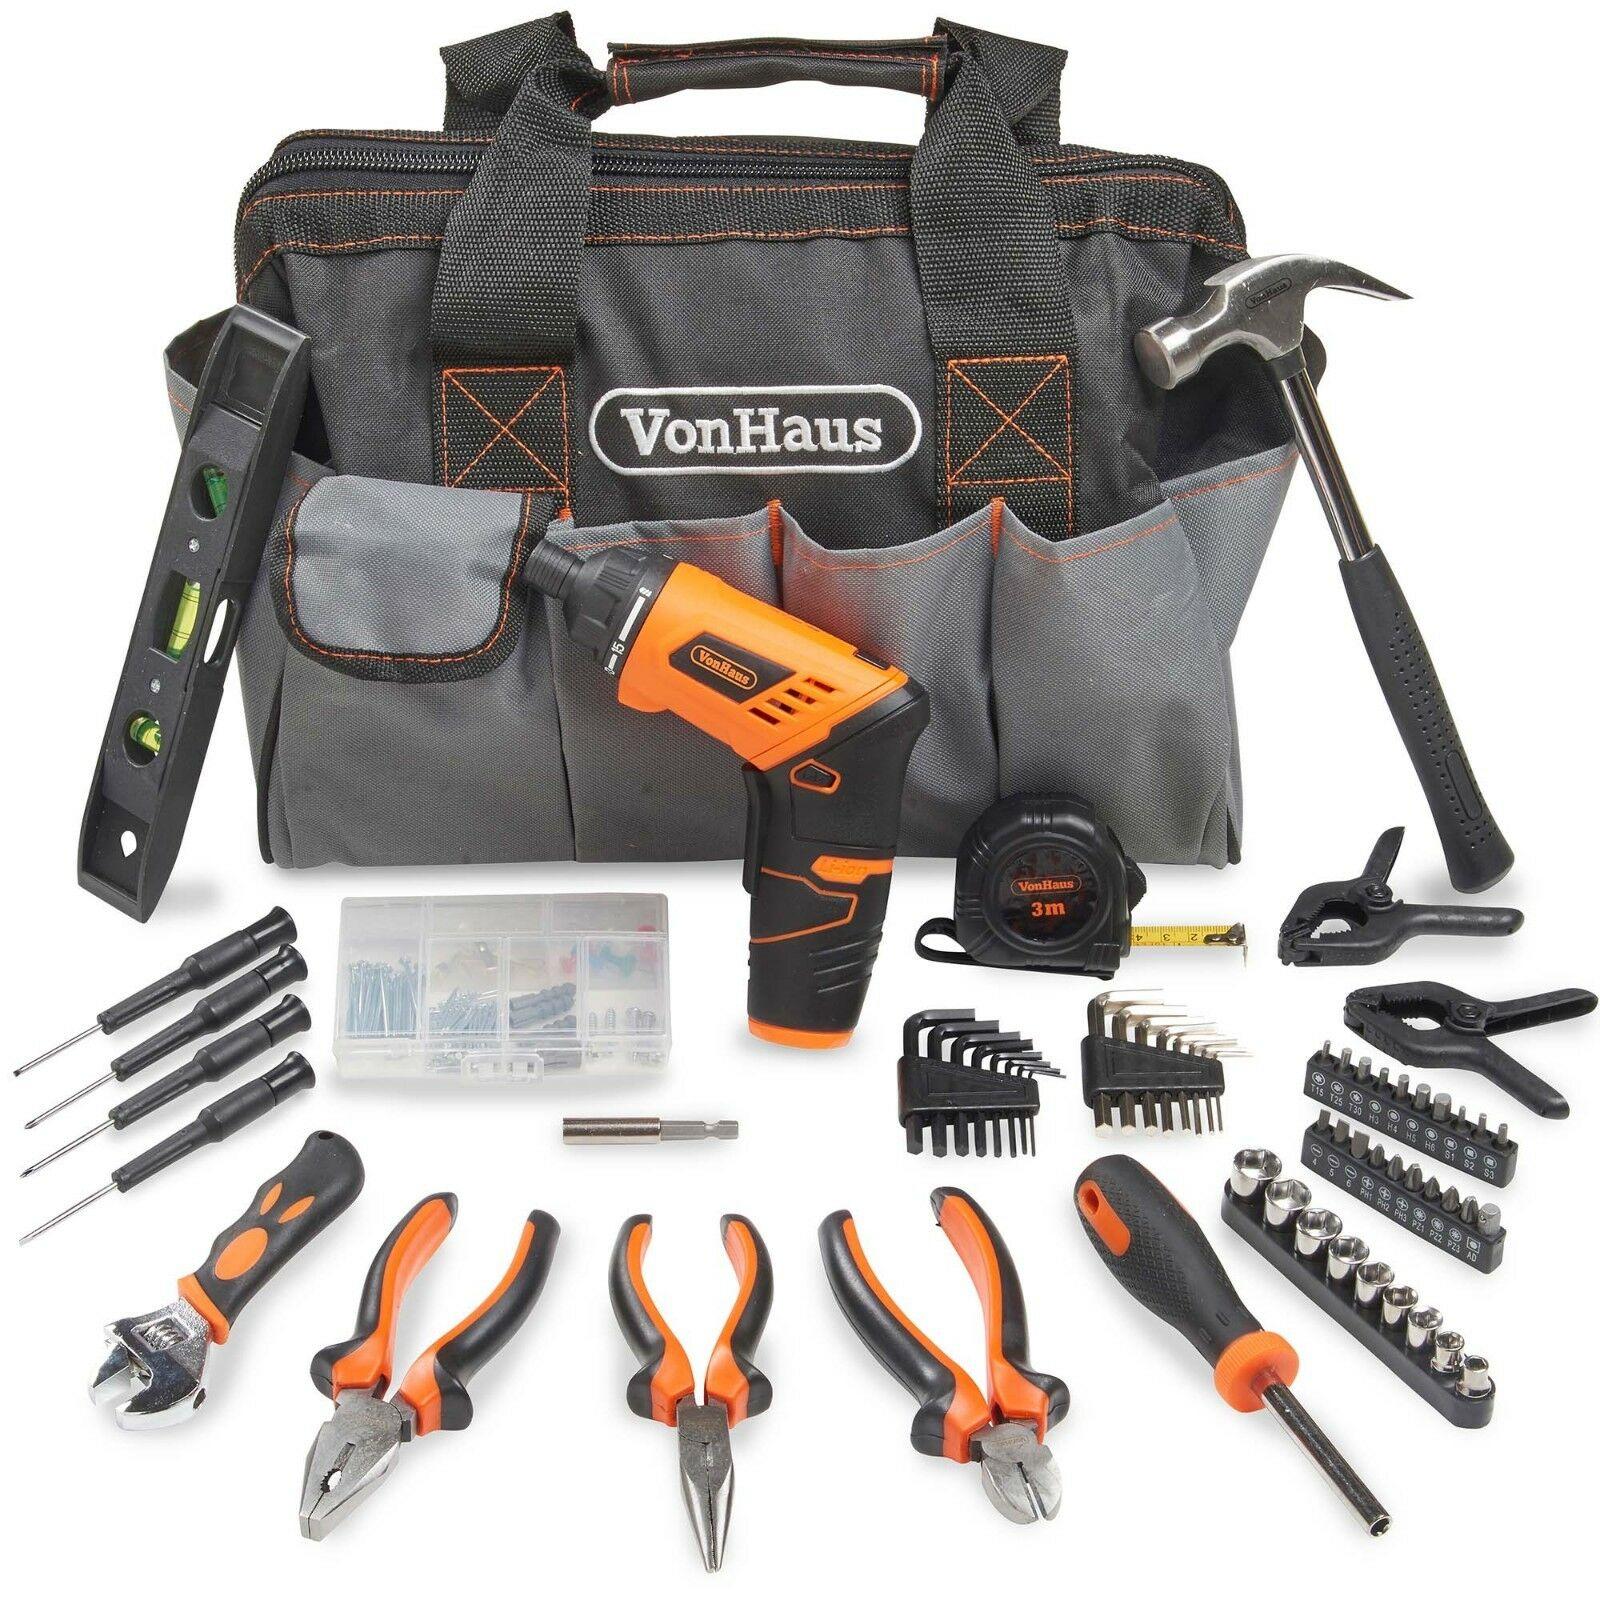 VonHaus 94 piece Household Hand Tool Set + Screwdriver Combo Kit - £24.84 delivered @ Domu eBay